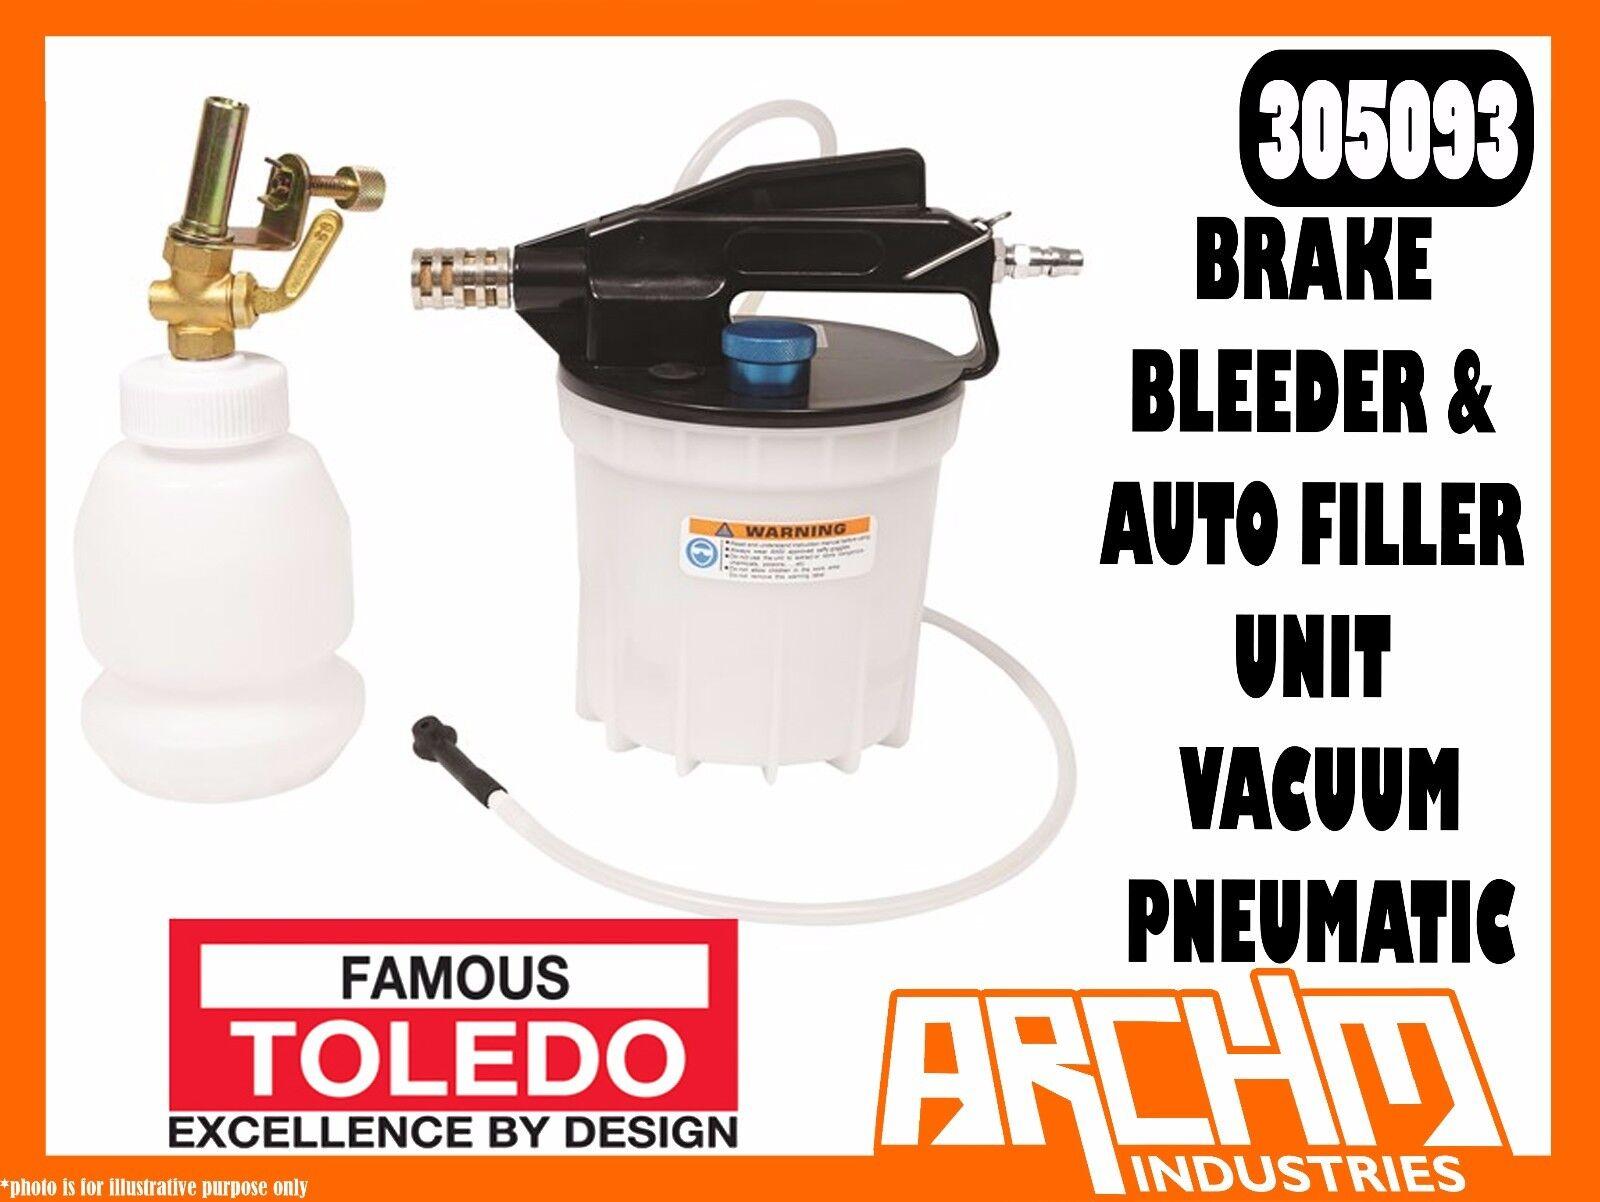 TOLEDO 305093 - BRAKE BLEEDER & AUTO FILLER UNIT VACUUM - PNEUMATIC - CLUTCH